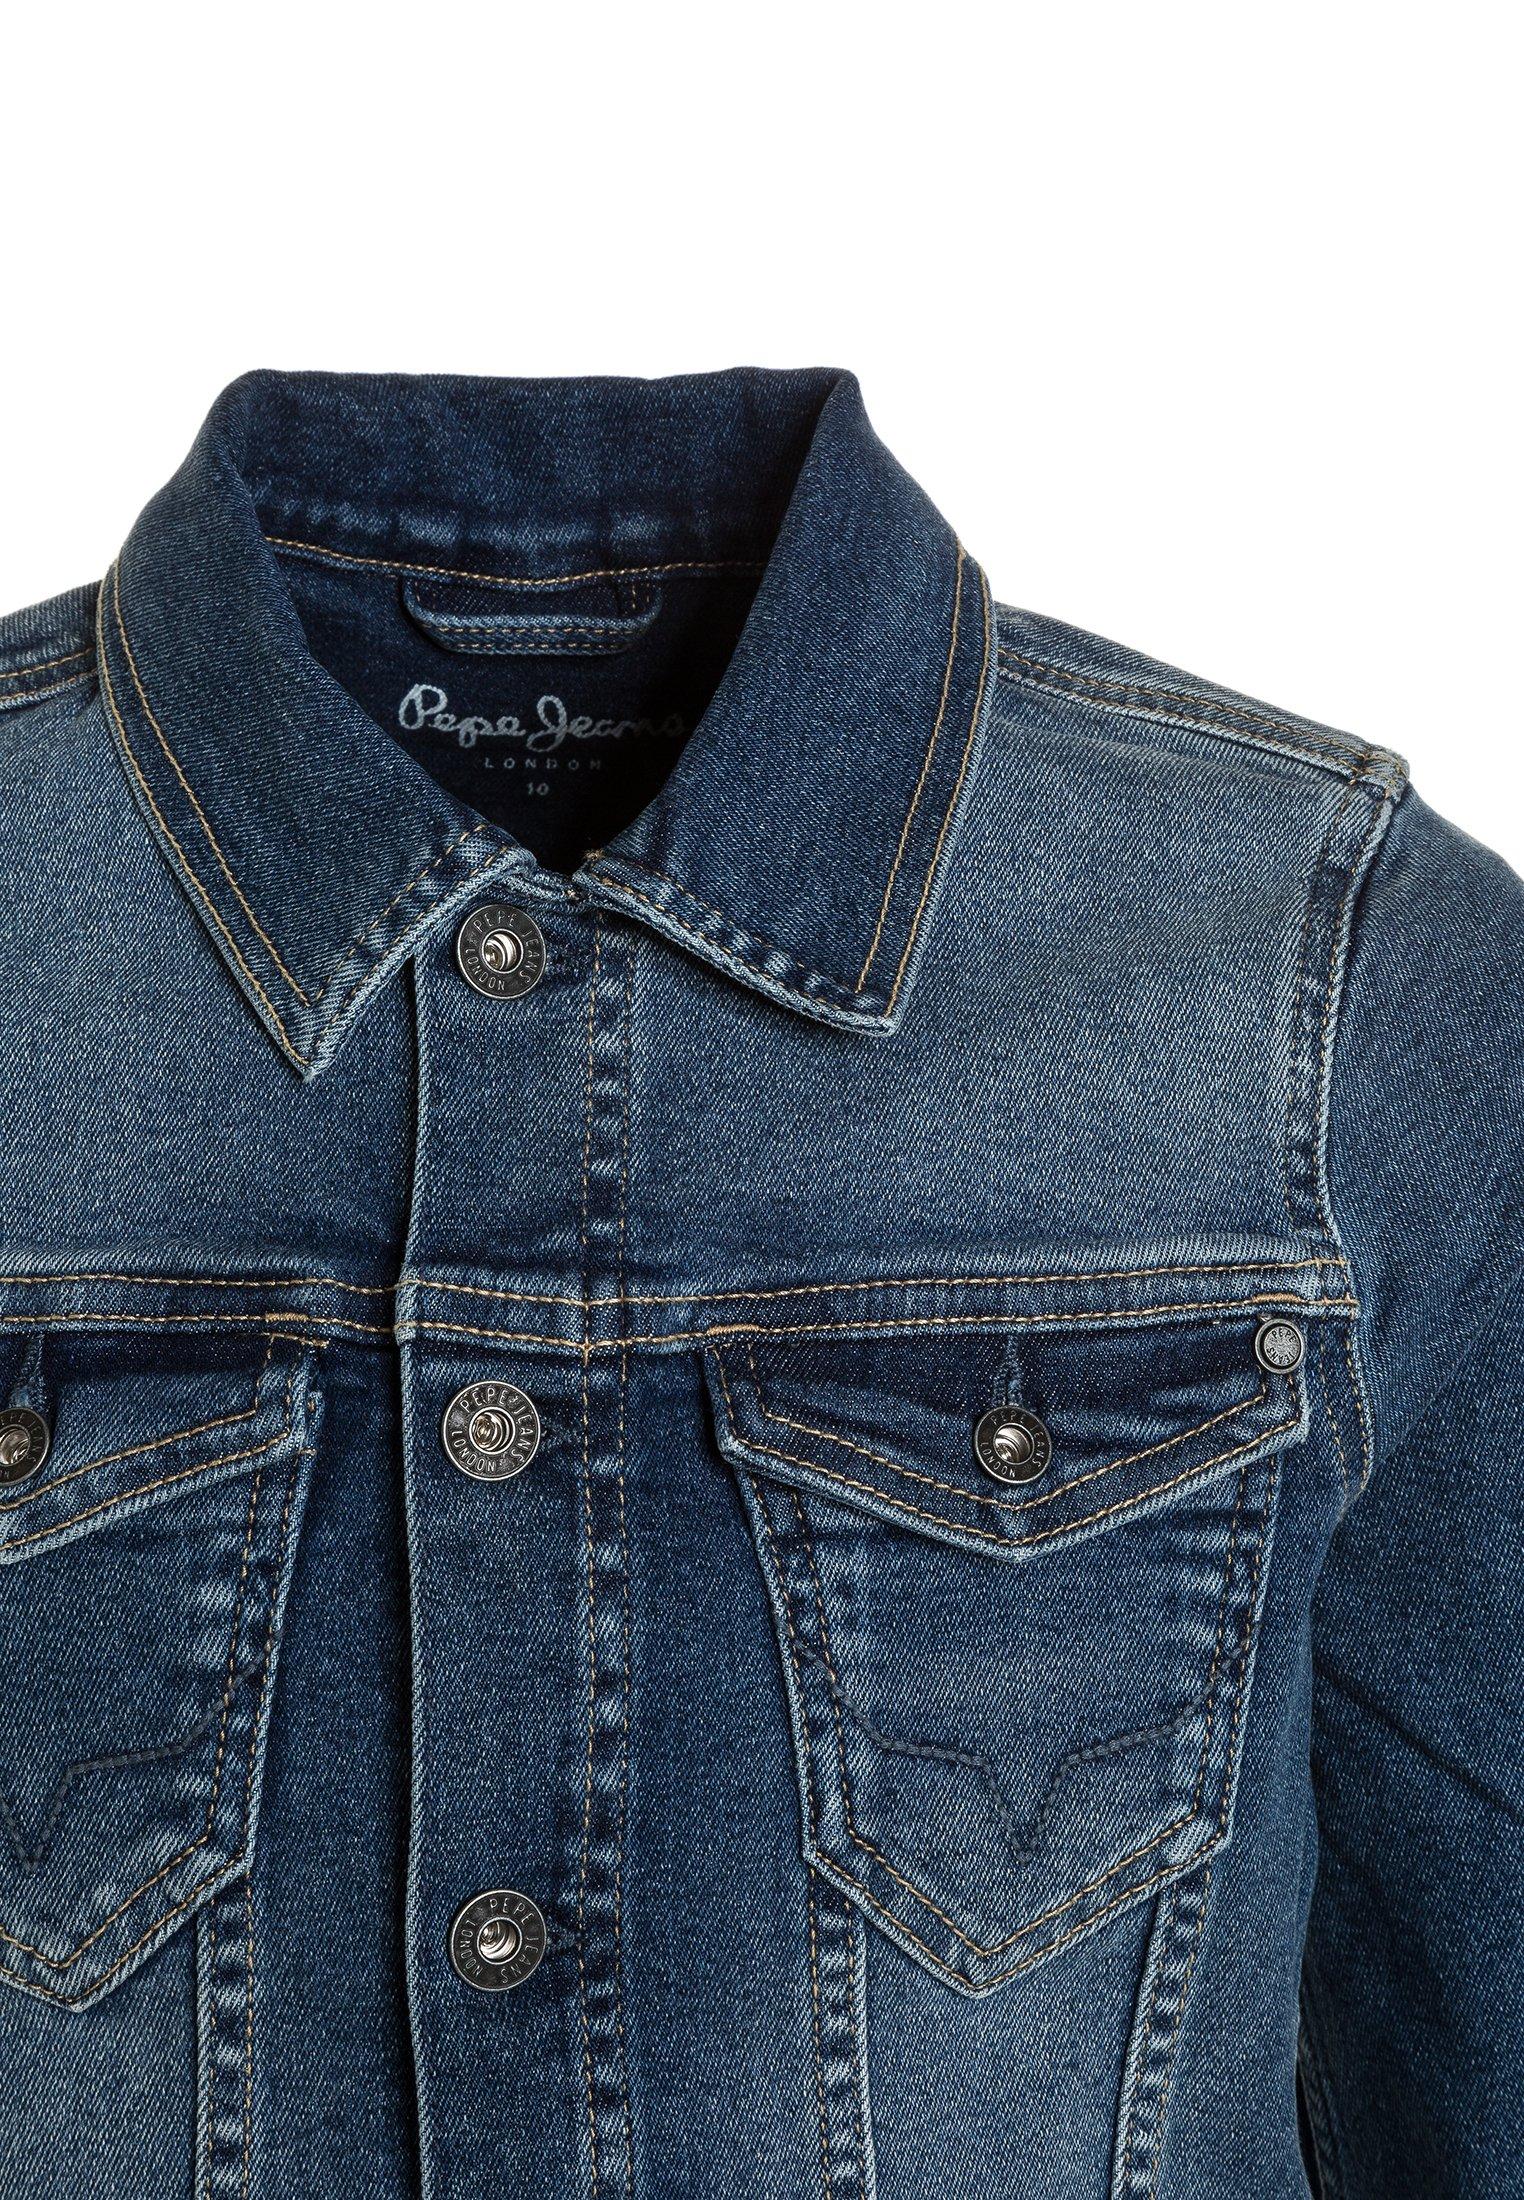 Pepe Jeans, Legendary Denim jakke